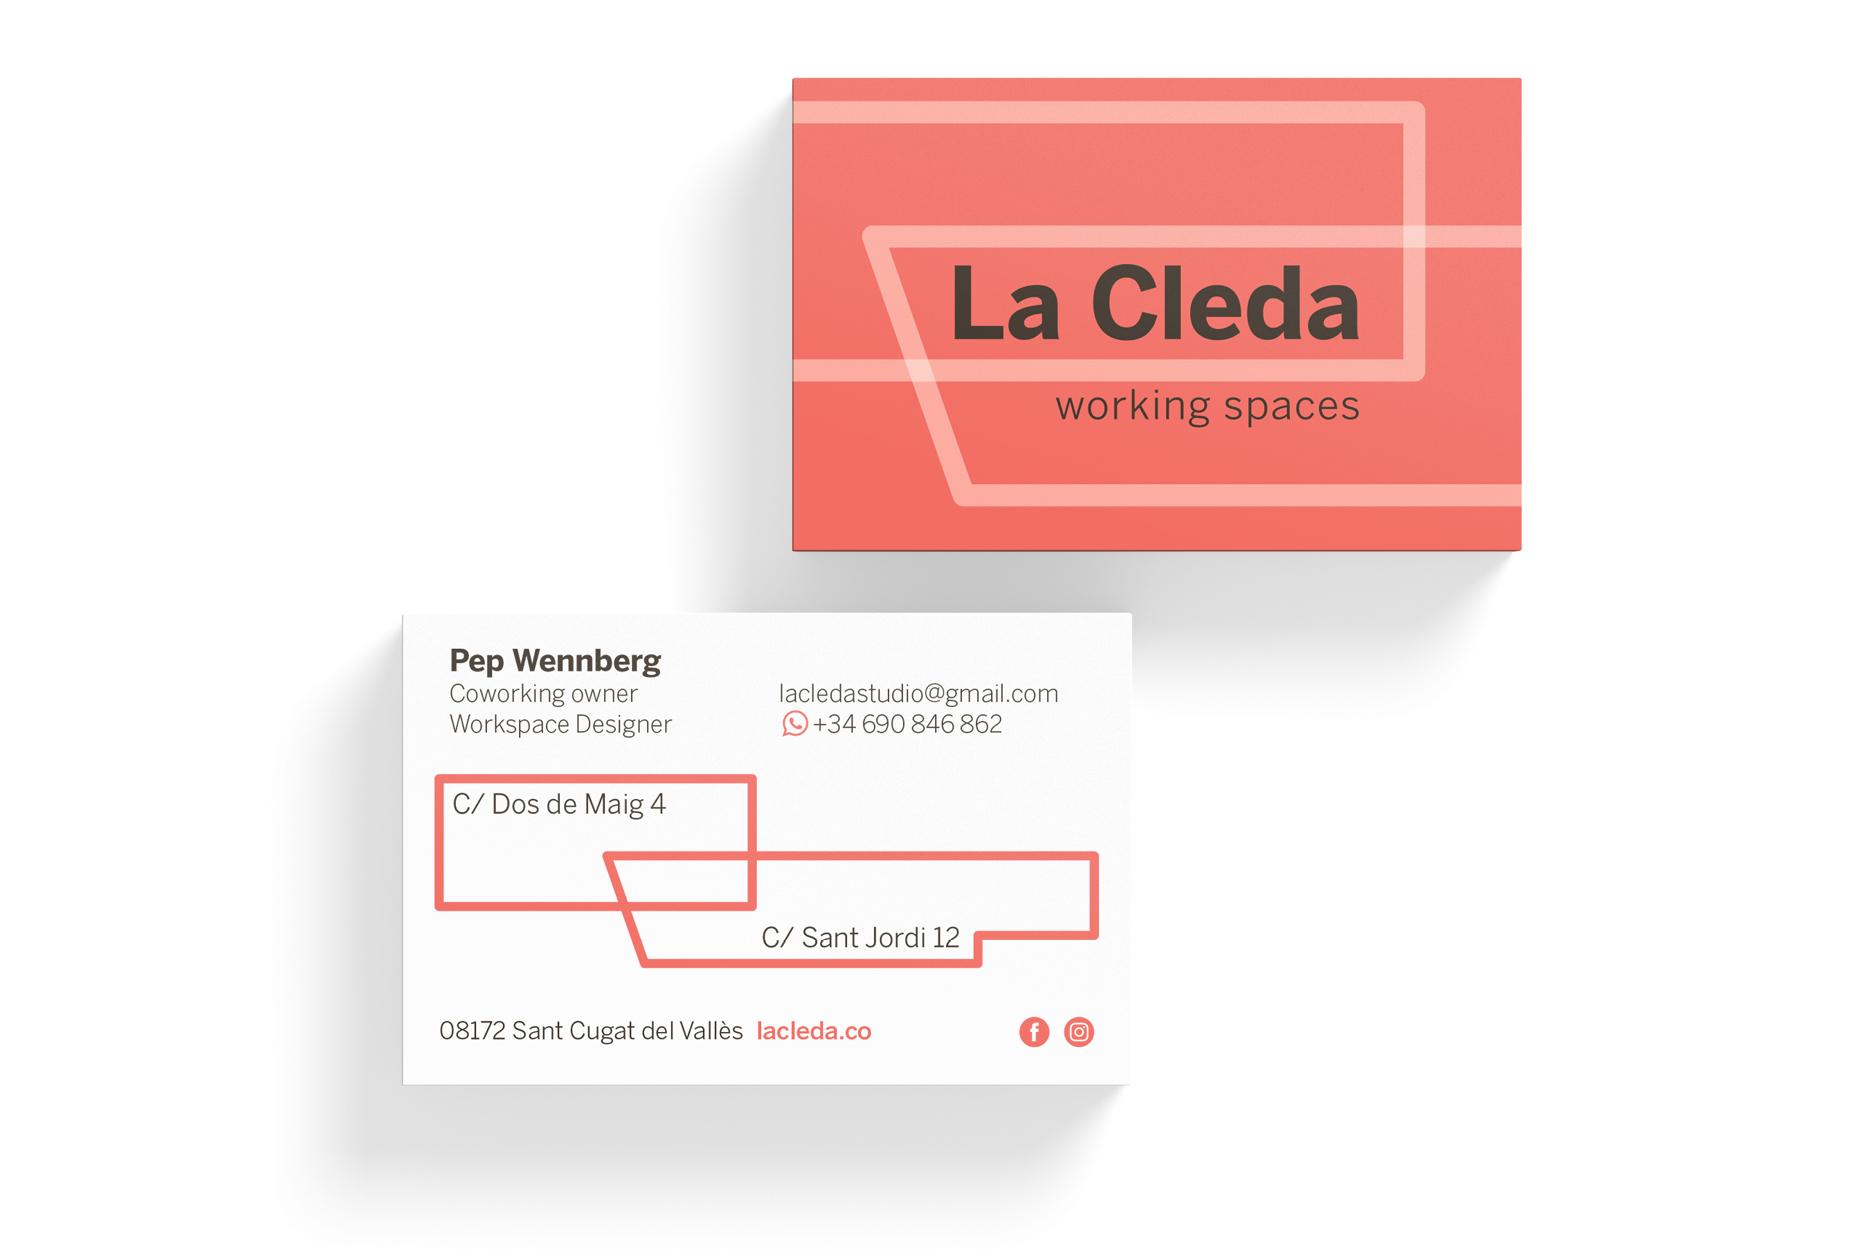 La Cleda_web6.jpg